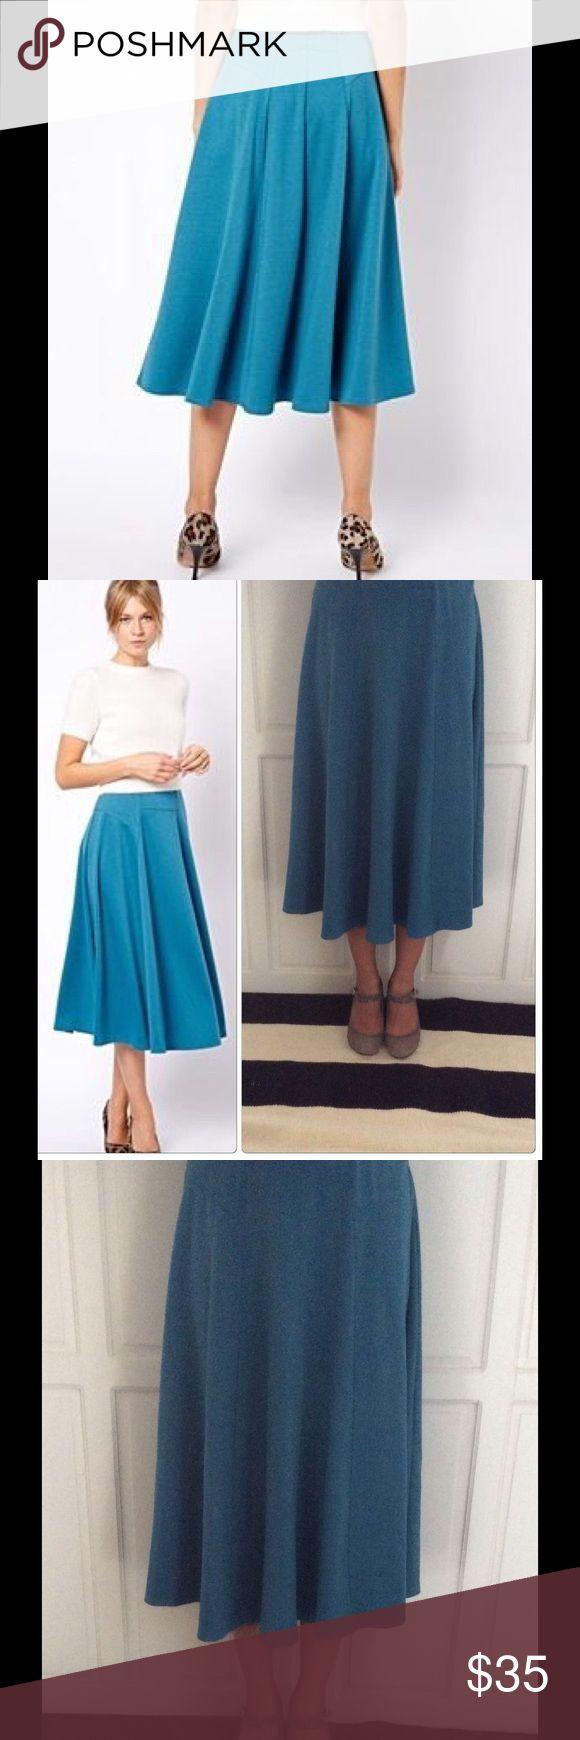 ASOS Aline Midi Skirt with Zip NWOT ASOS Teal Aline Midi Skirt with Zip and Pocket Turquoise Detail NWOT Size US 6, 14.5 waist/27 length ASOS Skirts Midi